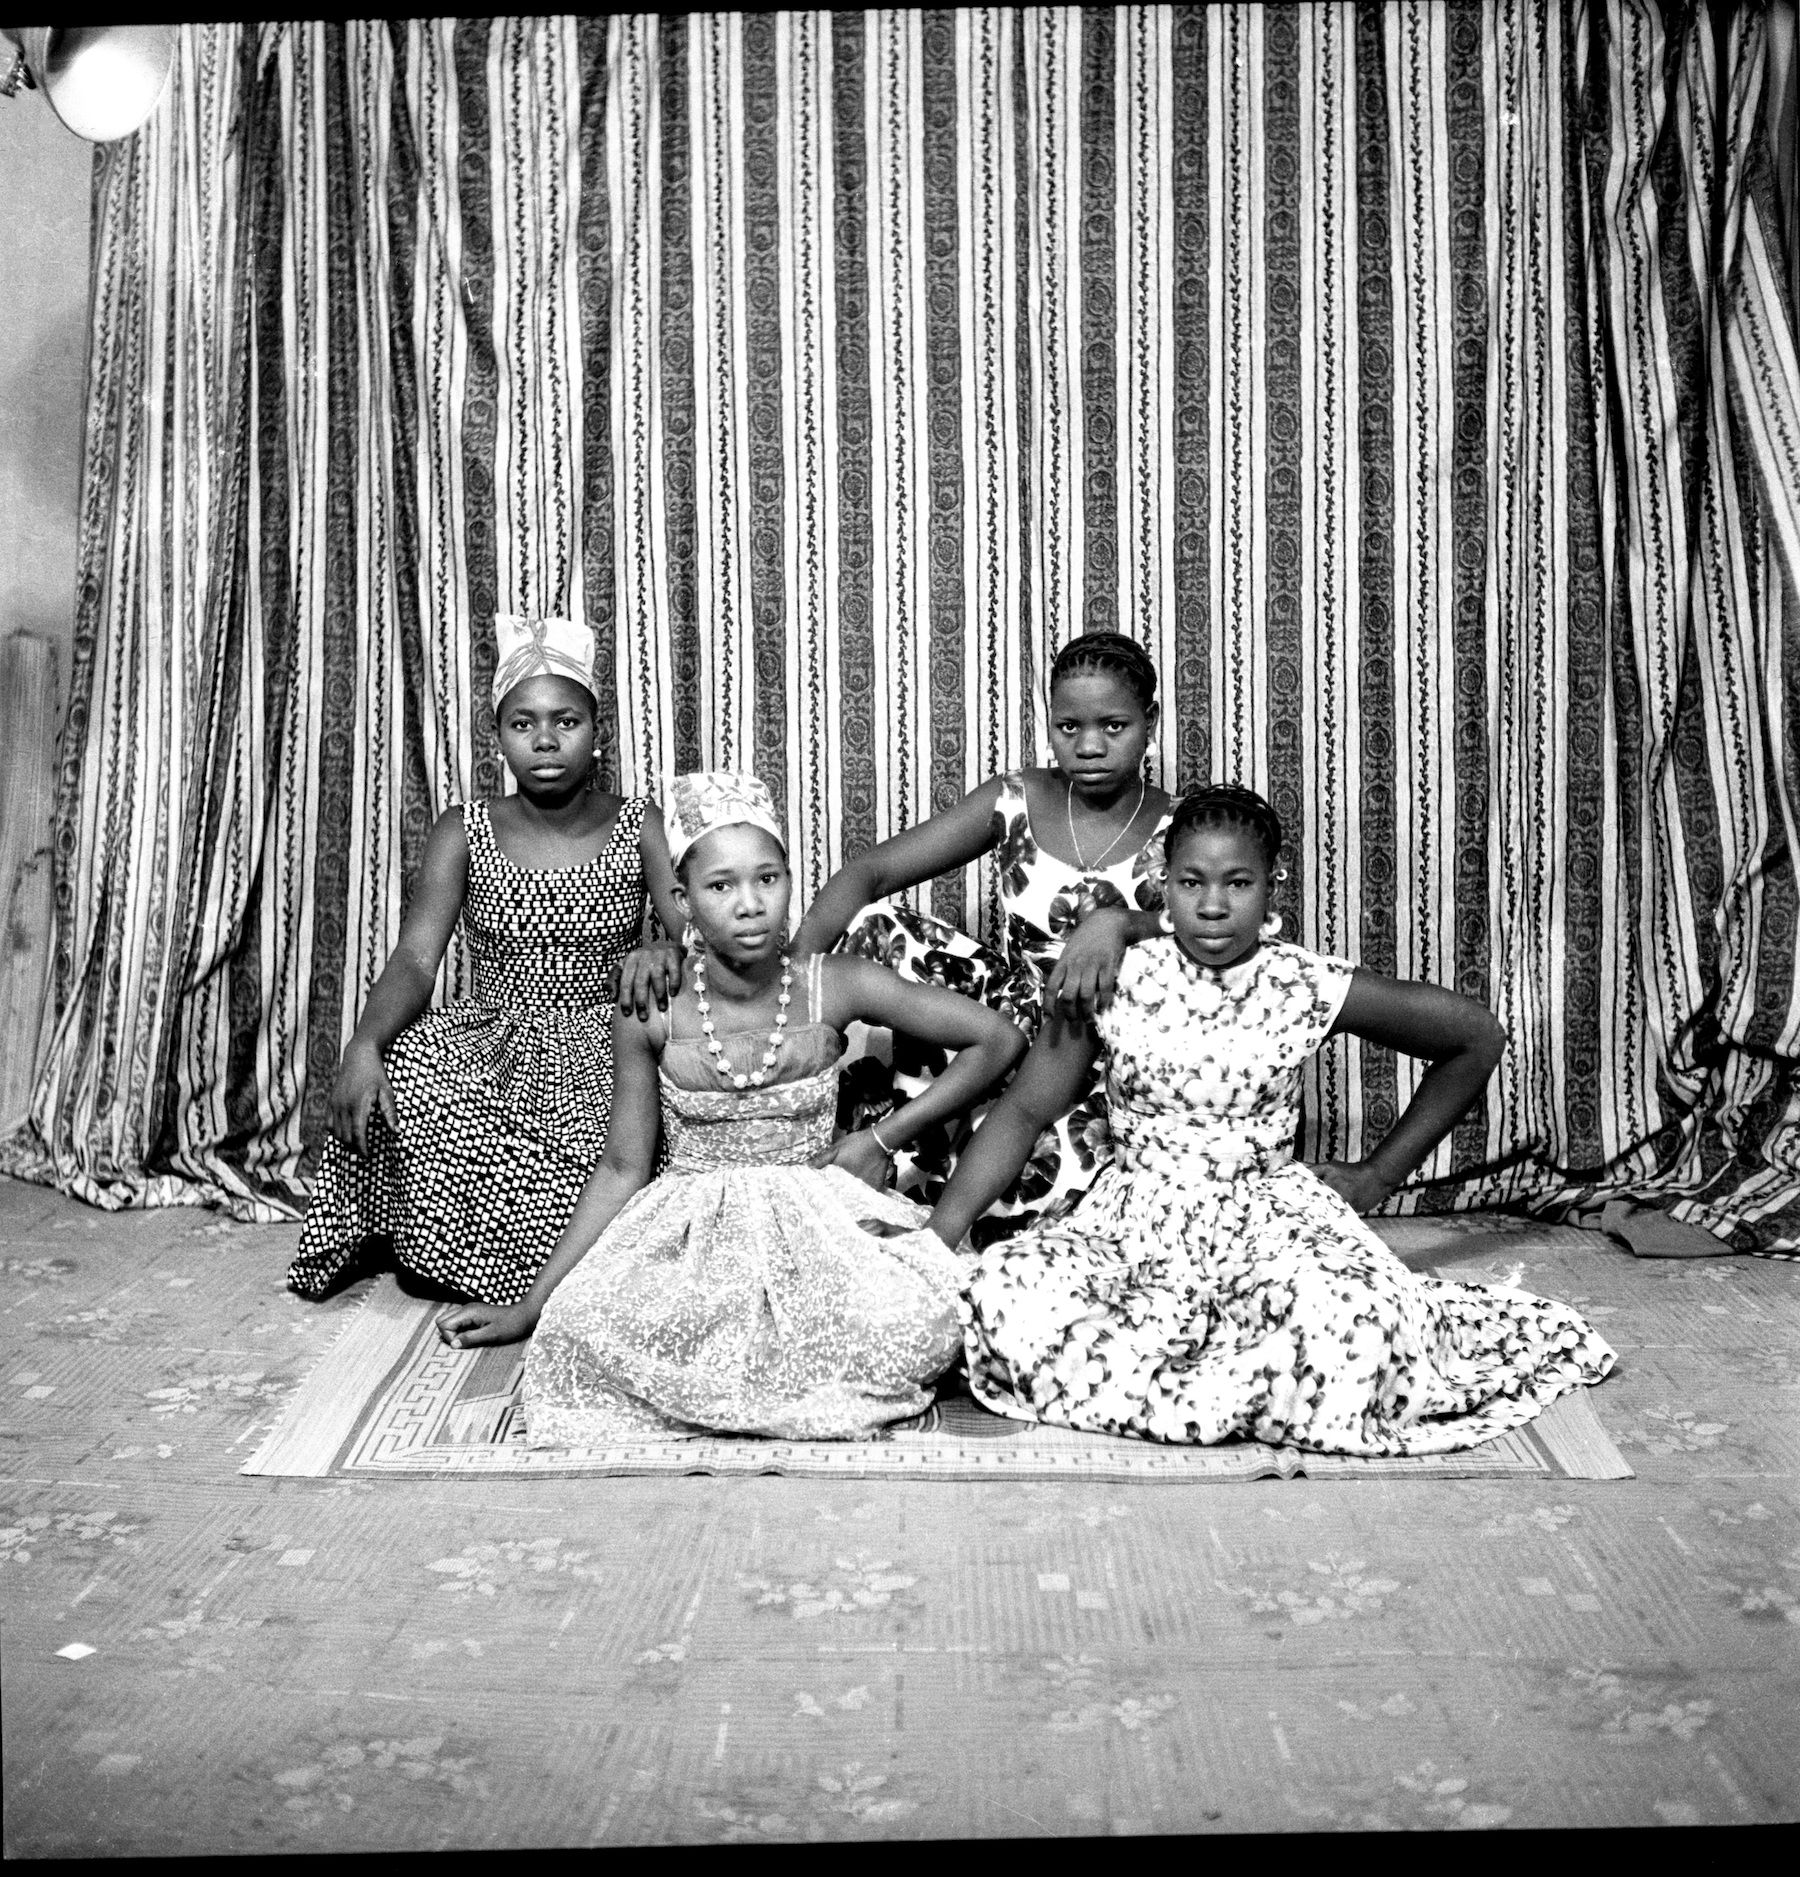 Abdourahmane Sakaly, Jeunes copines, May 1962. Courtesy the artist and Black Shade Projects